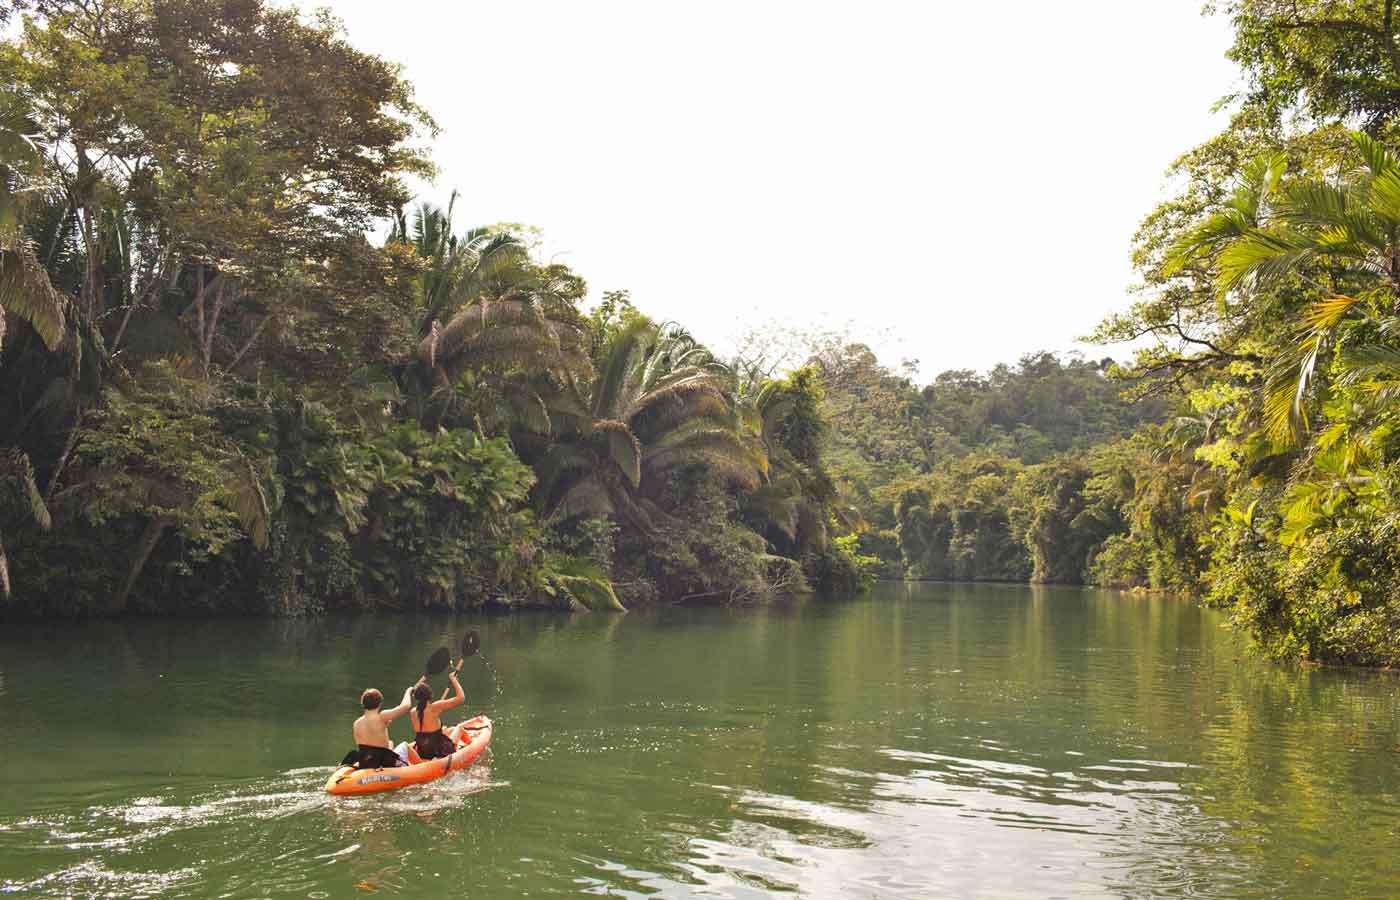 Copal Tree Lodge, Belize, luxury Belize, Belize luxury holidays, luxury holidays to Belize, tailor-made holidays to Belize